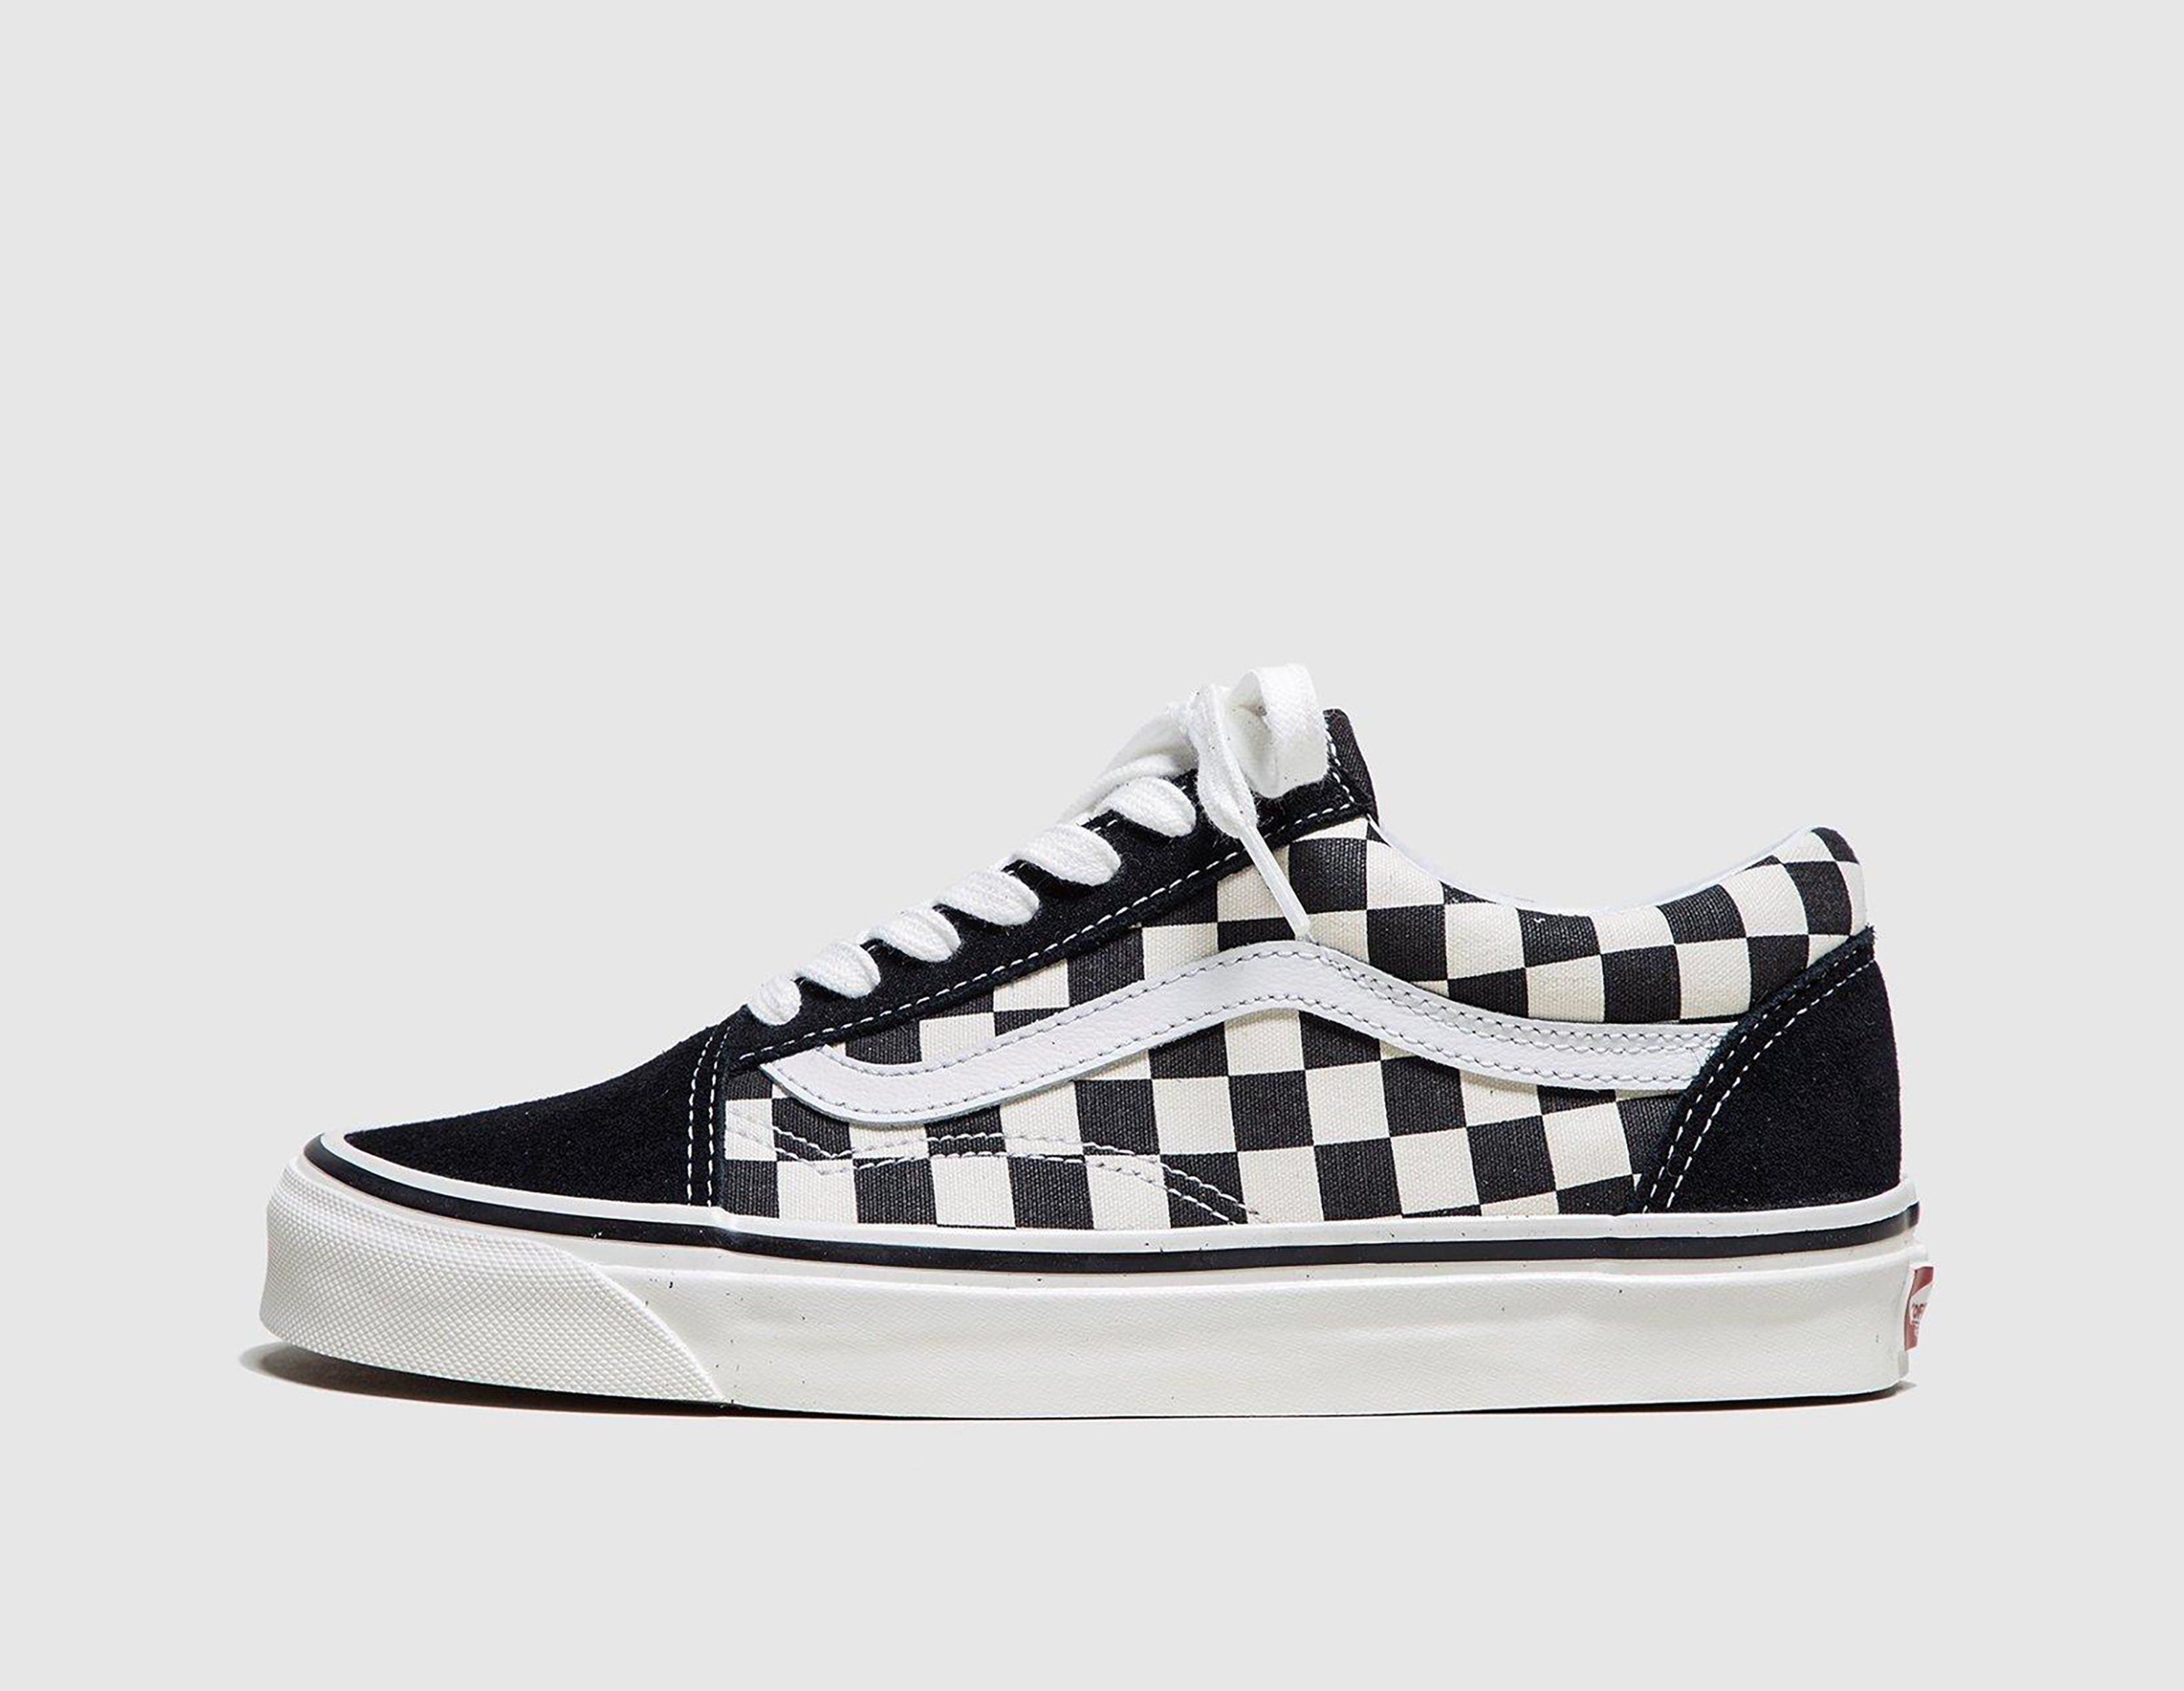 Vans Anaheim Old Skool Checkerboard Women s  1a8d158a08e6